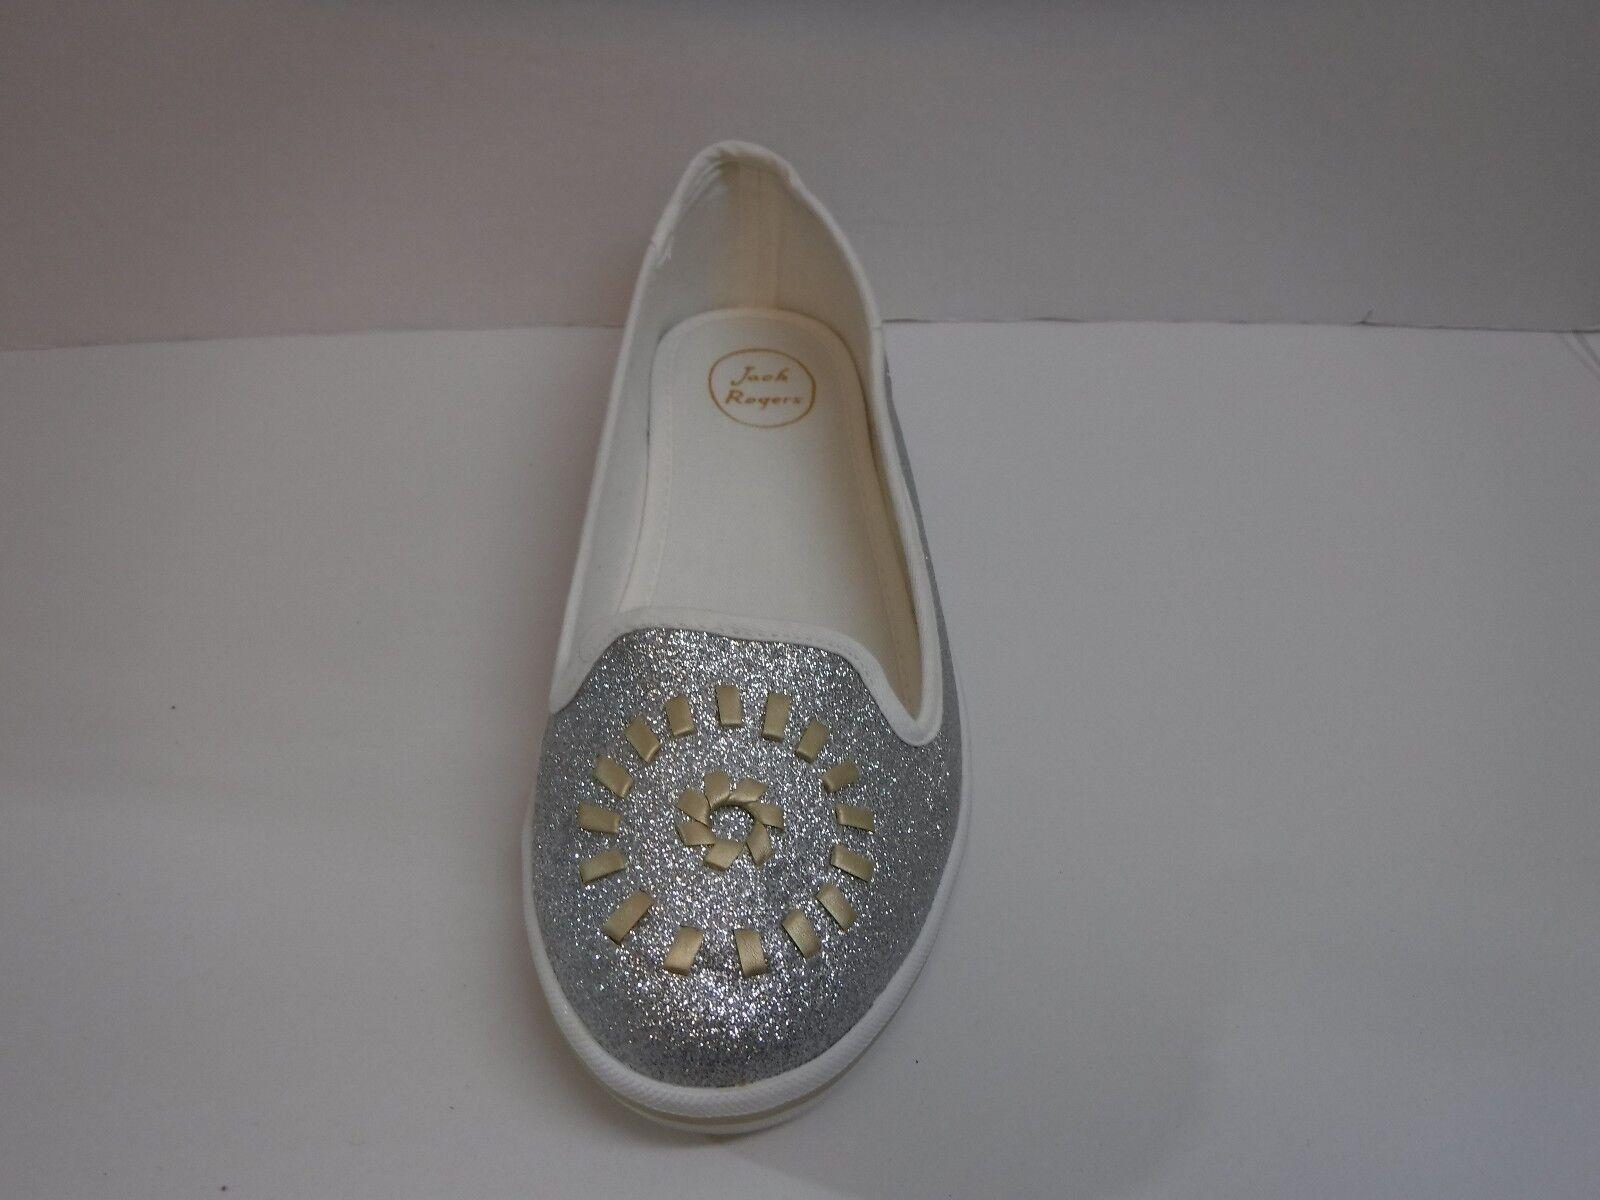 Jack Glitter Rogers Größe 8.5 Silver Glitter Jack  Loafers Flats New Damenschuhe Schuhes 01af17